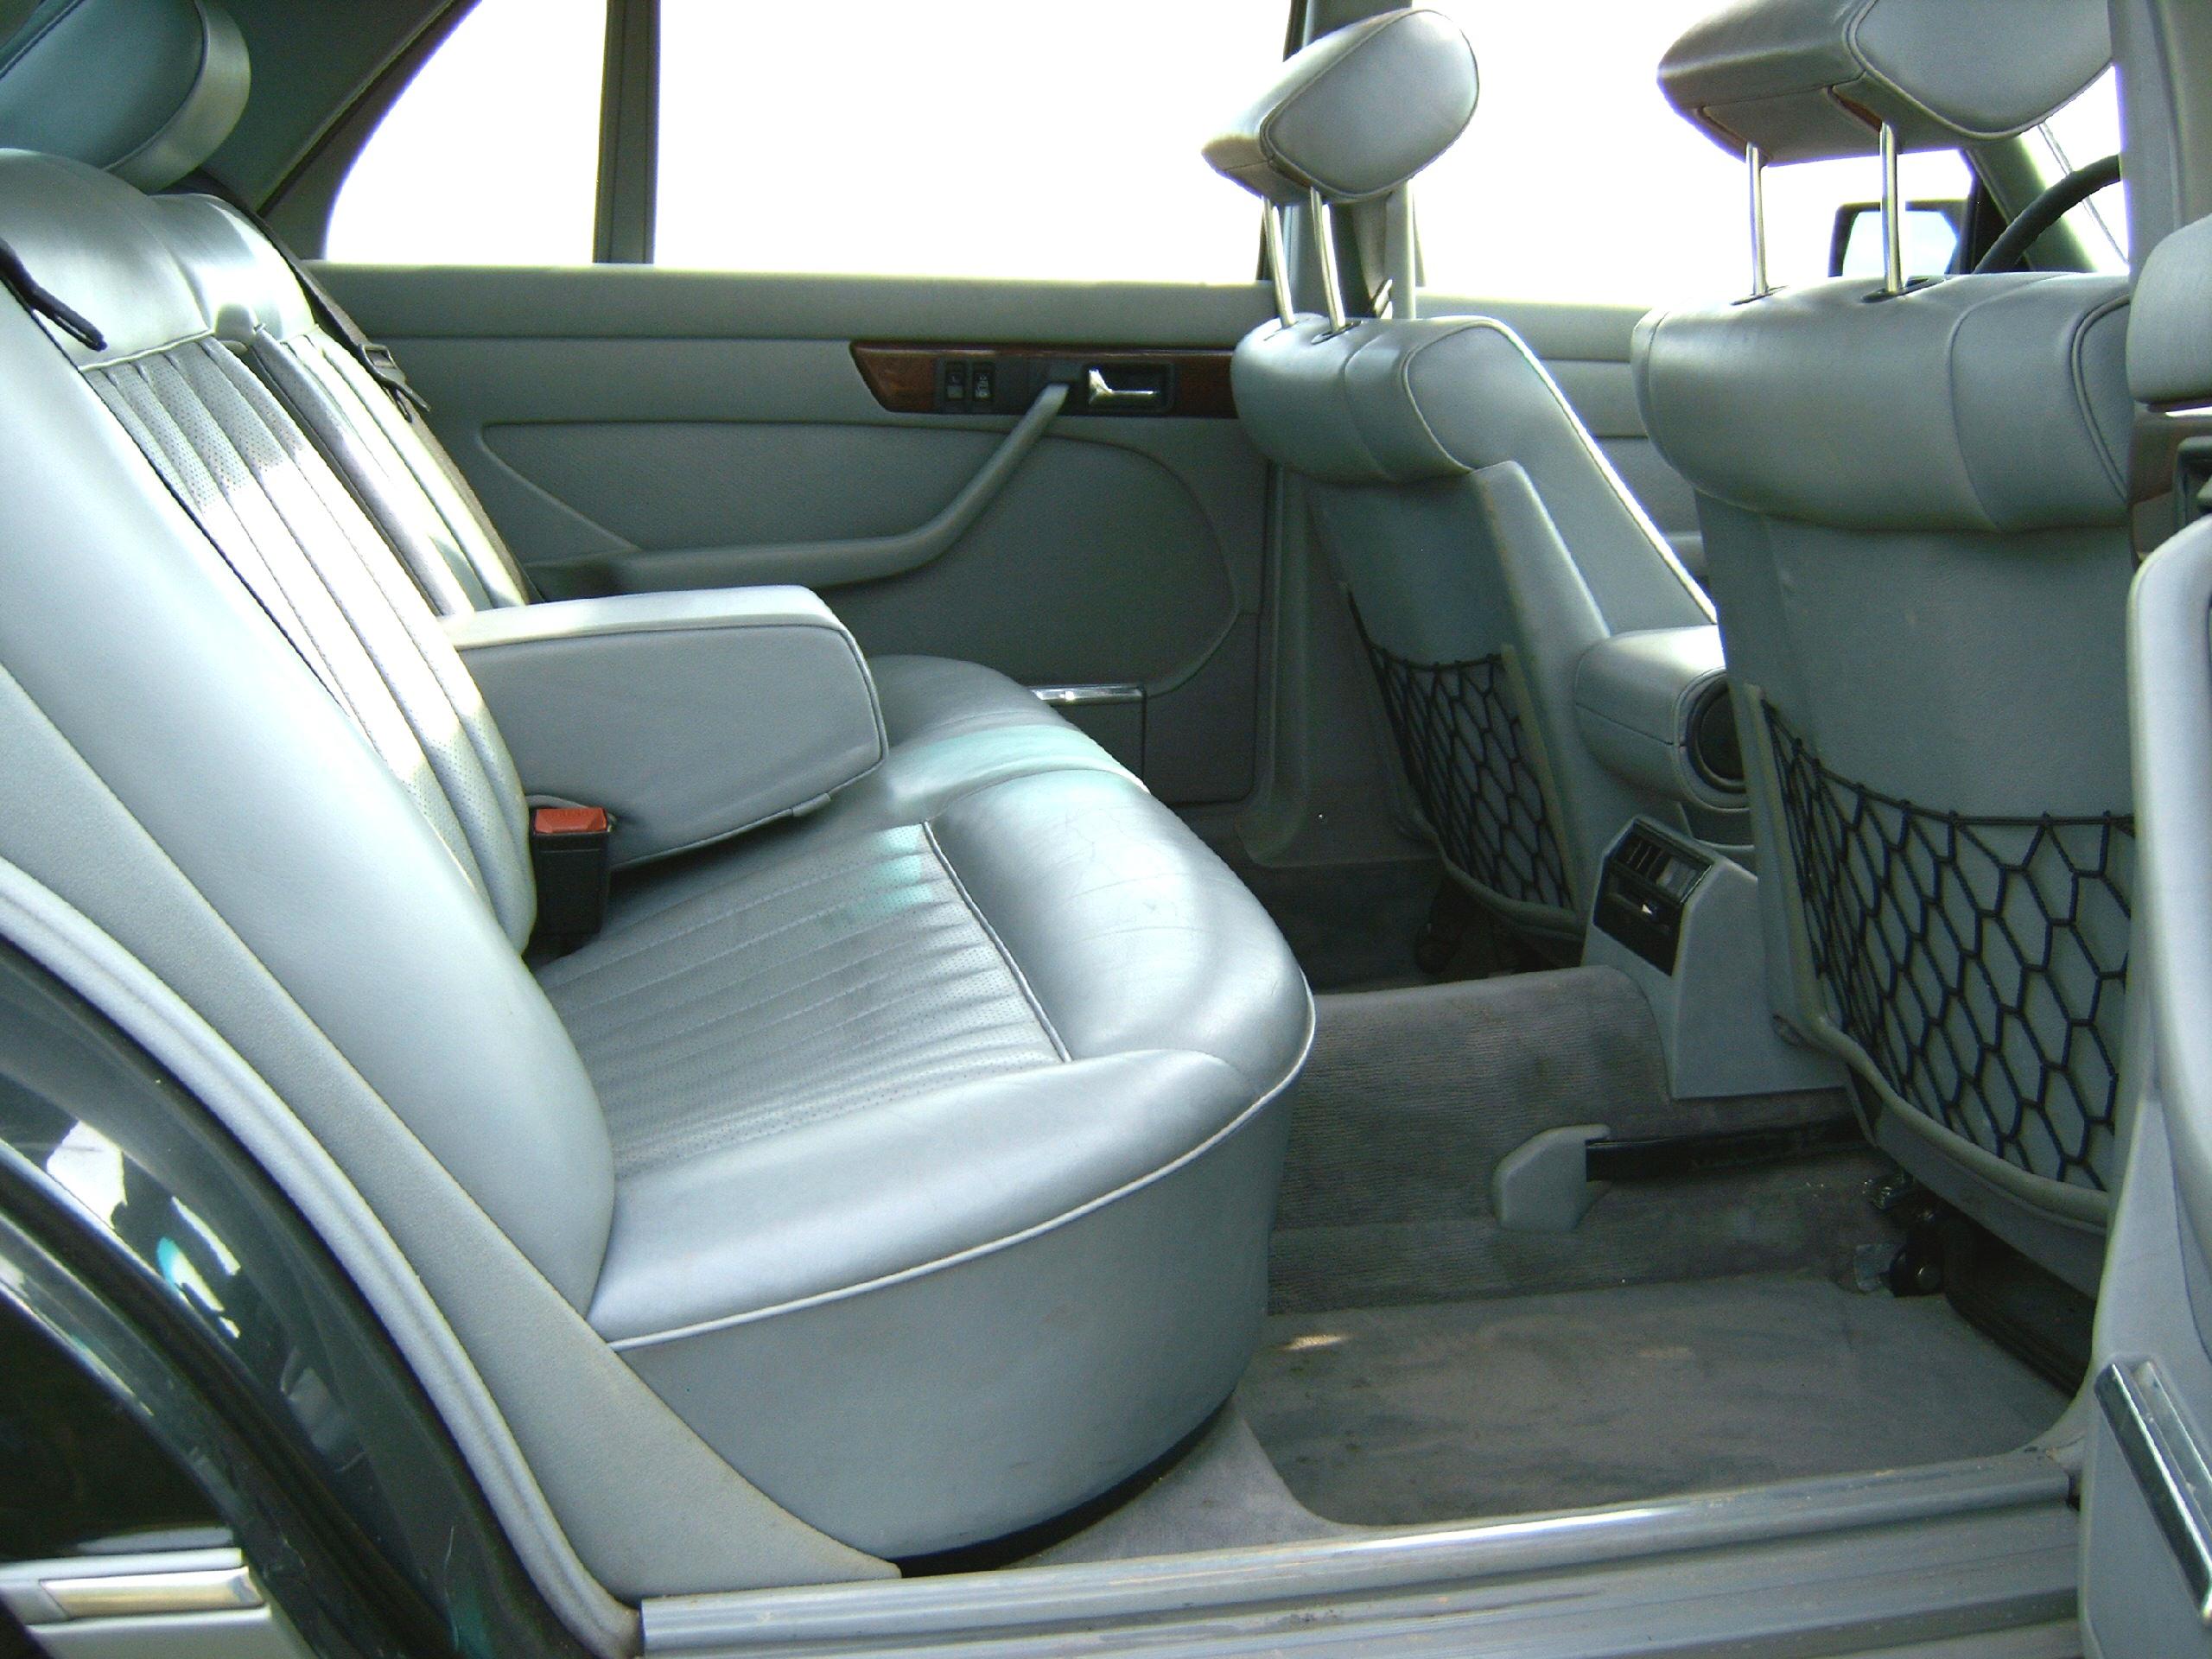 Mercedes W126 (the Queen) Mercedes_W126_500SEL_fond_1